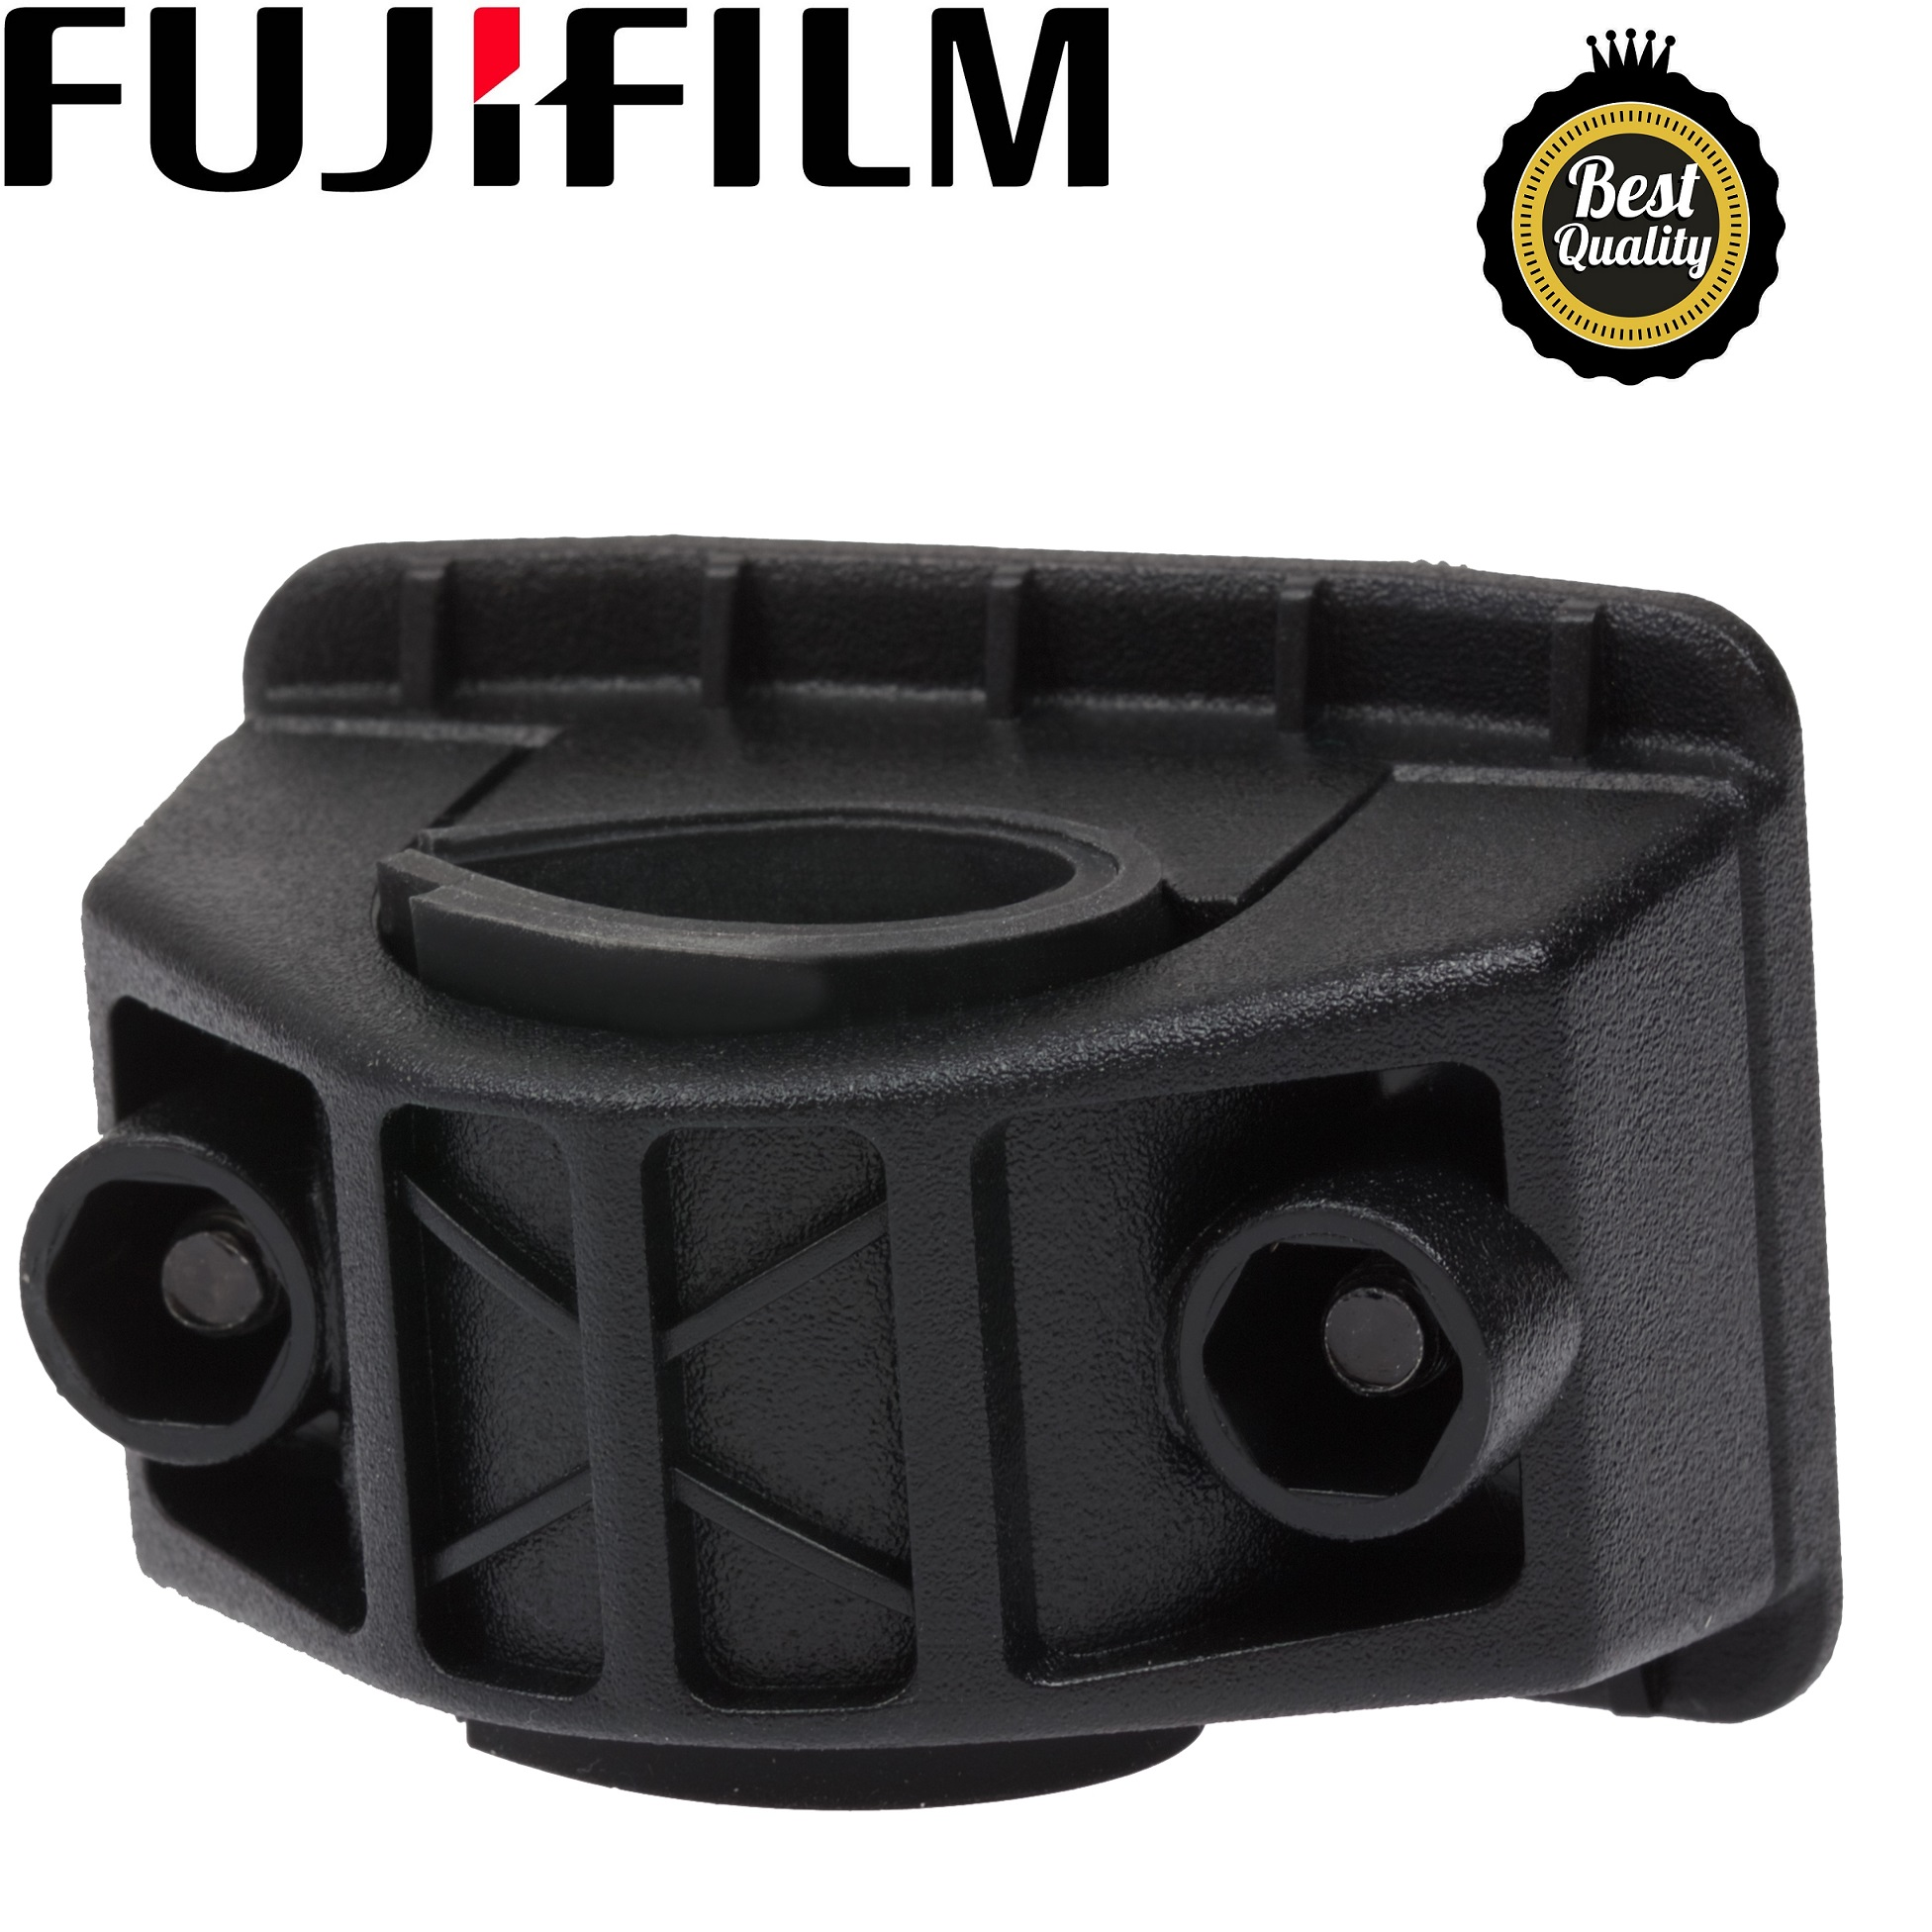 Fuji Bicycle HandleBar//Pole Mount for Camera Camcorder UK Stock